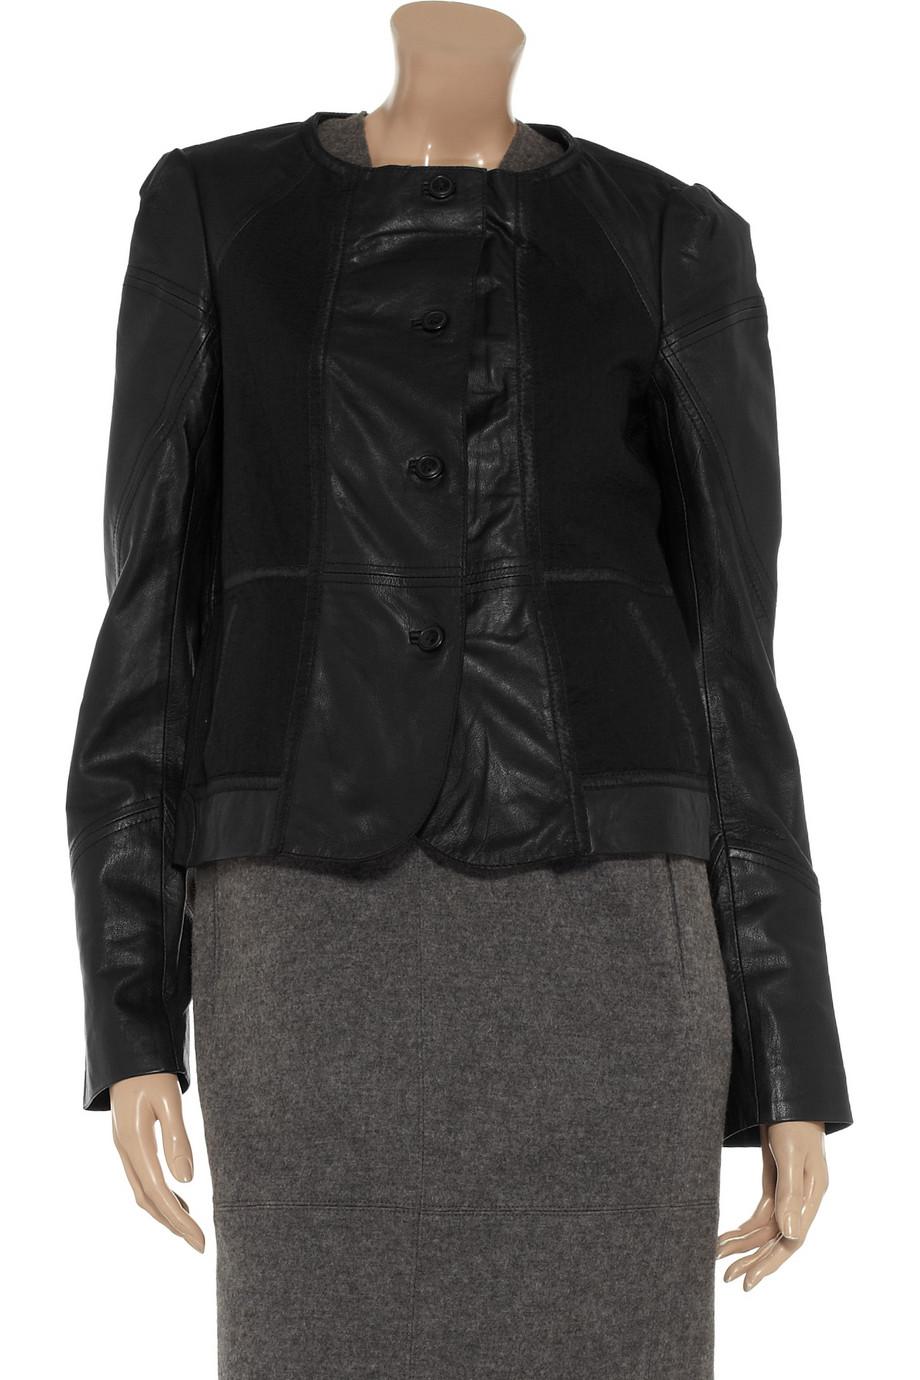 Vanessa bruno leather jacket